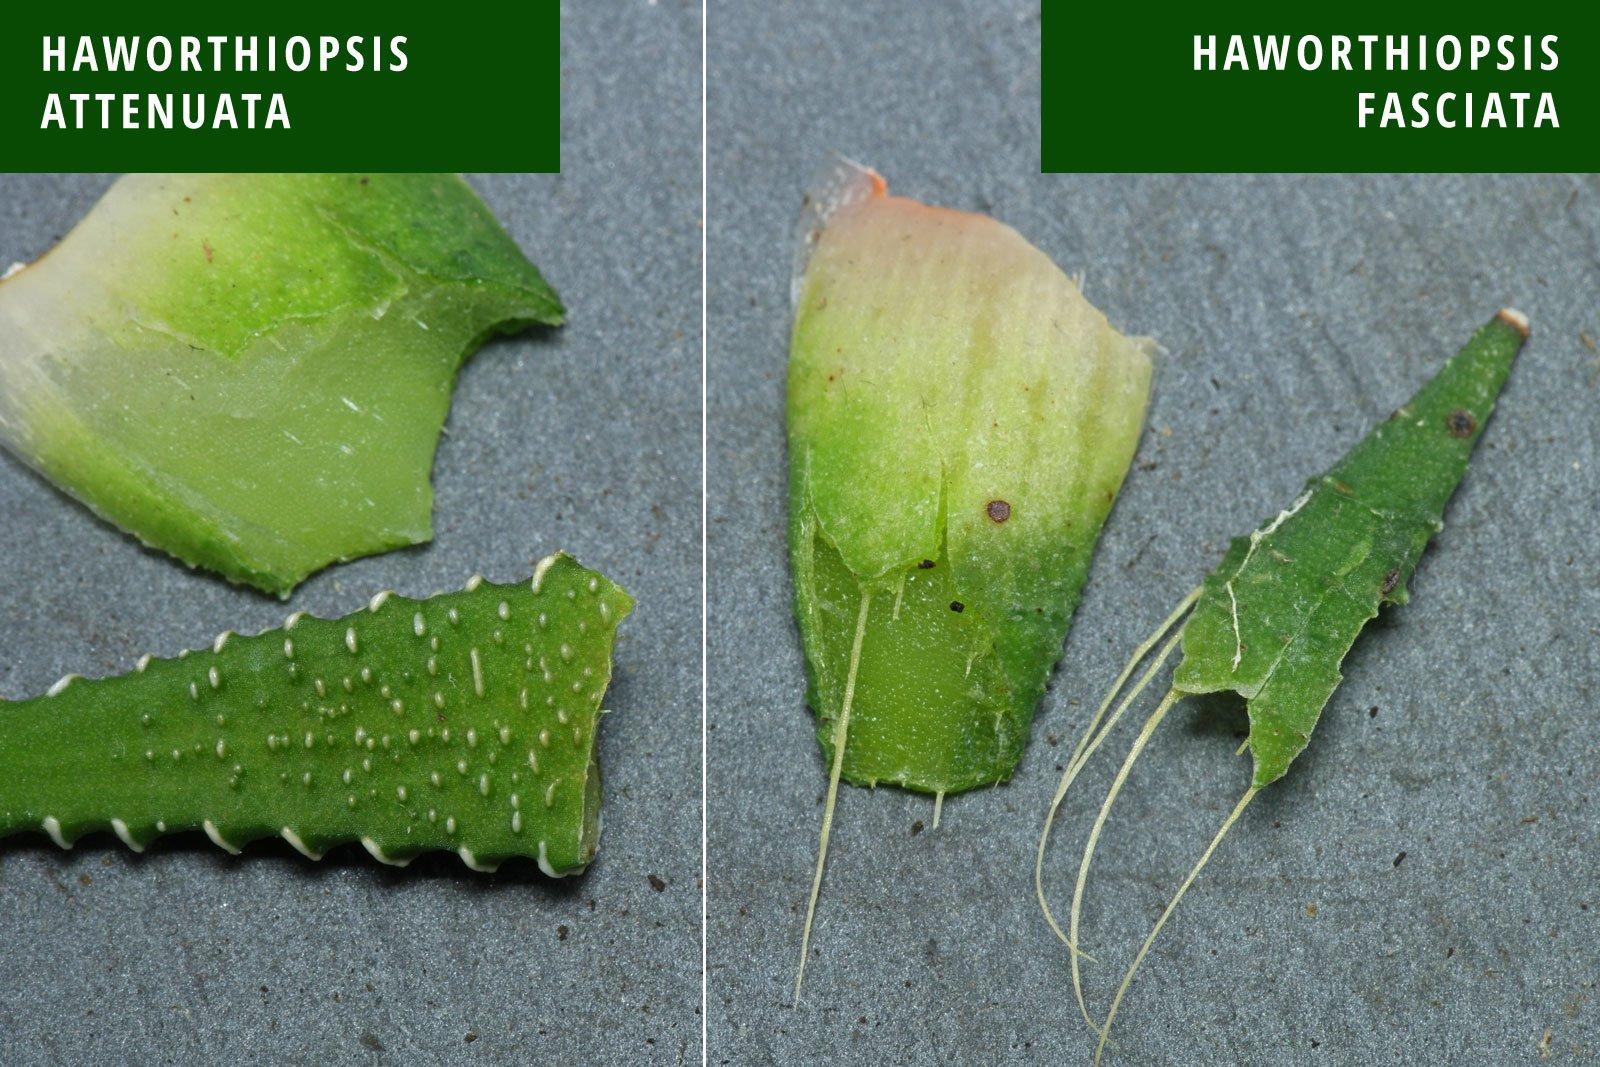 Haworthiopsis Haworthia attenuata fasciata